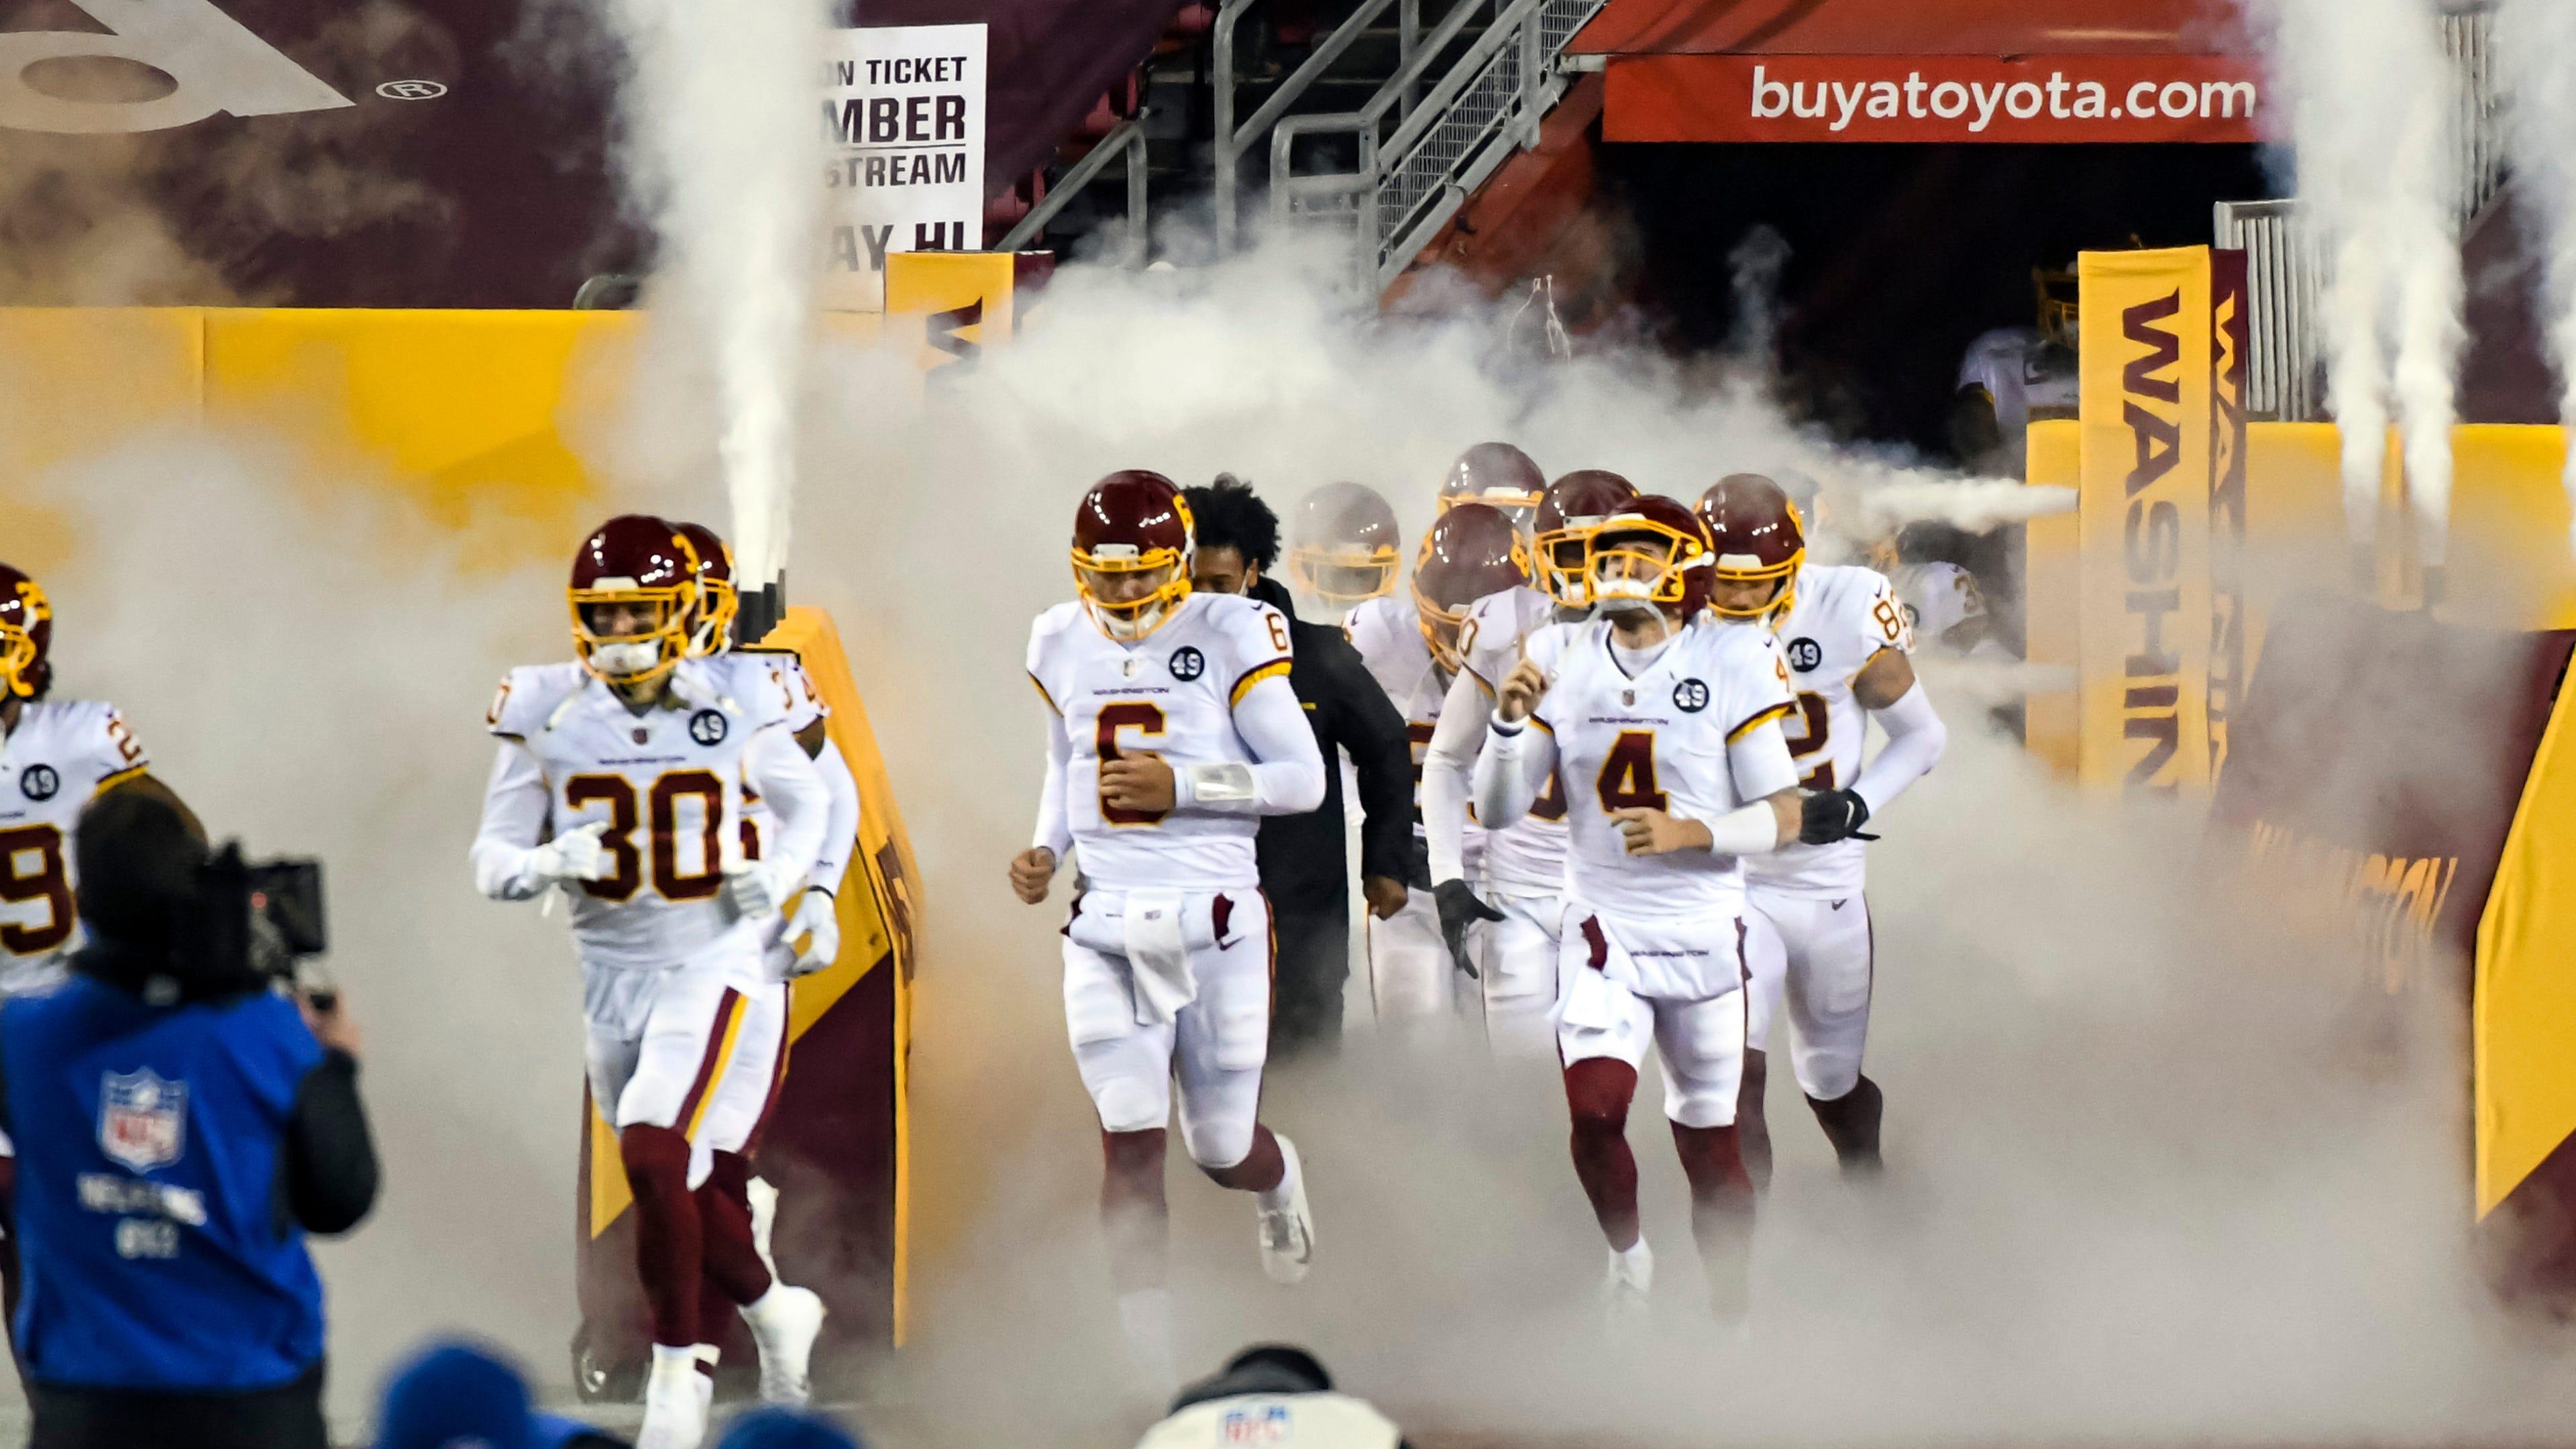 Washington Football Team to keep burgundy & gold with new name